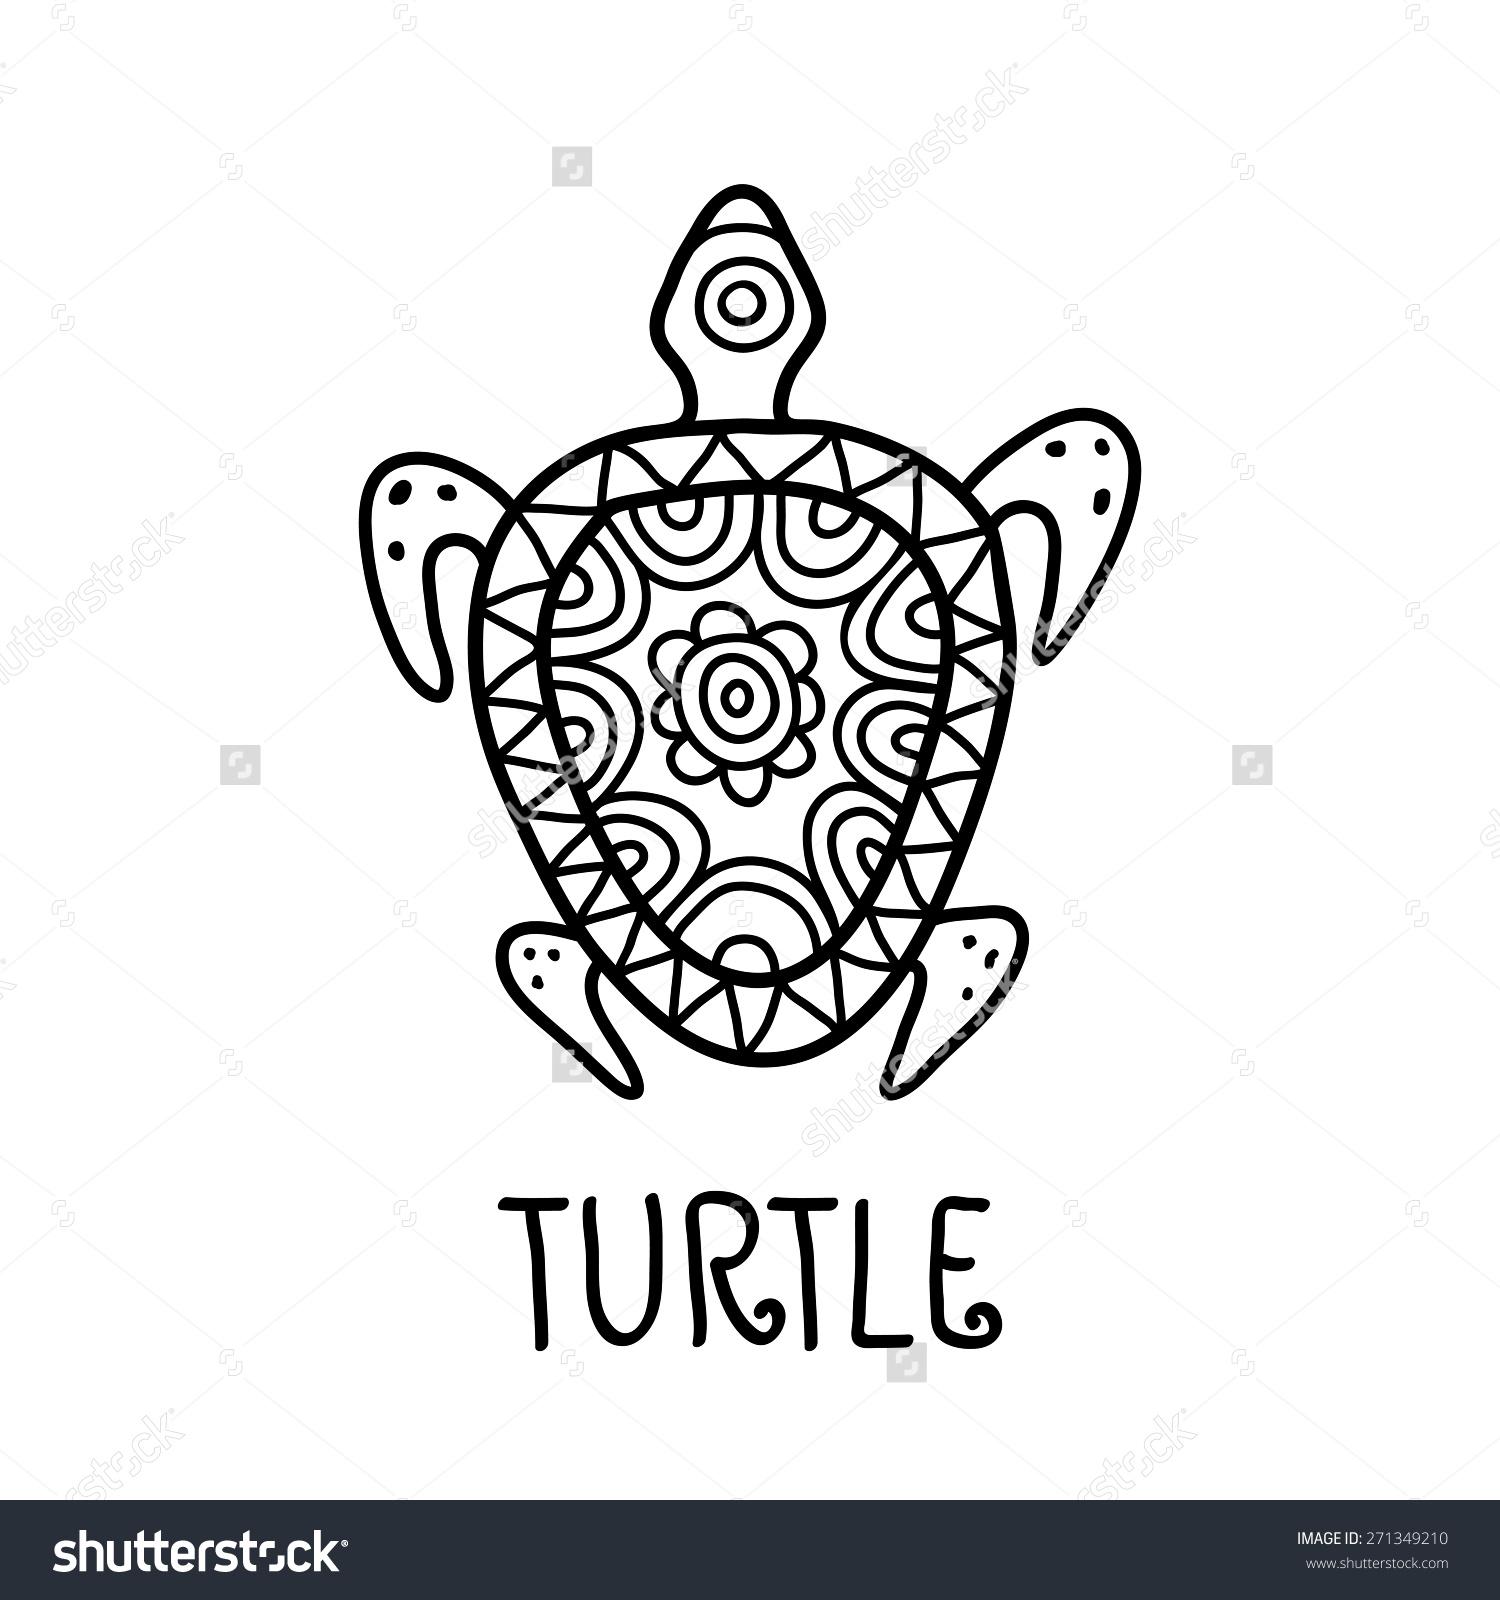 Drawn randome symbol #2